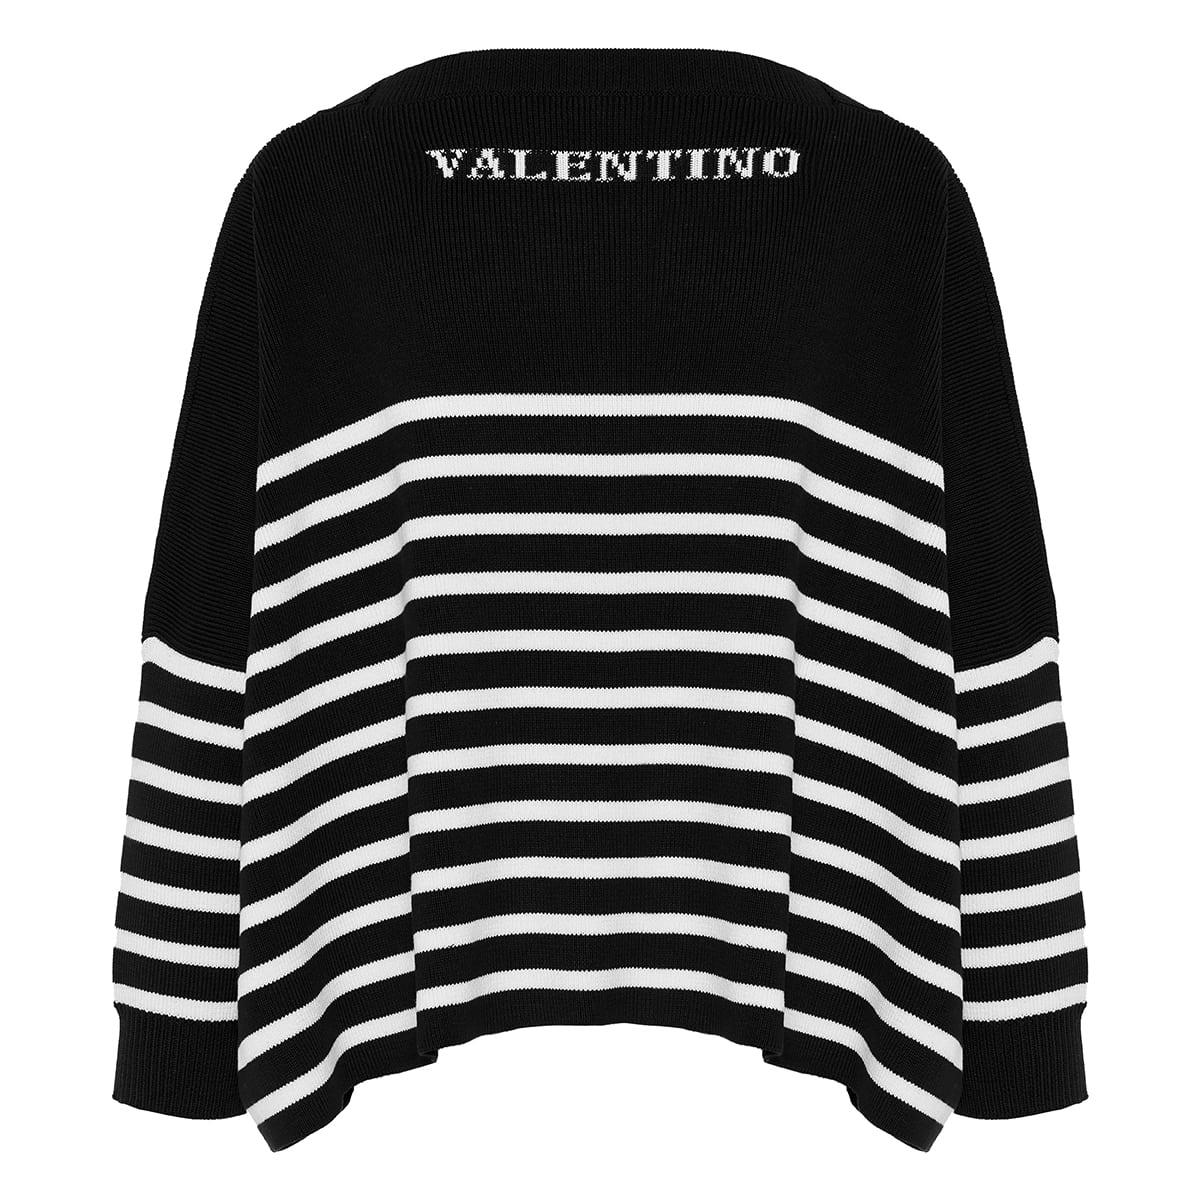 Oversized striped logo sweater